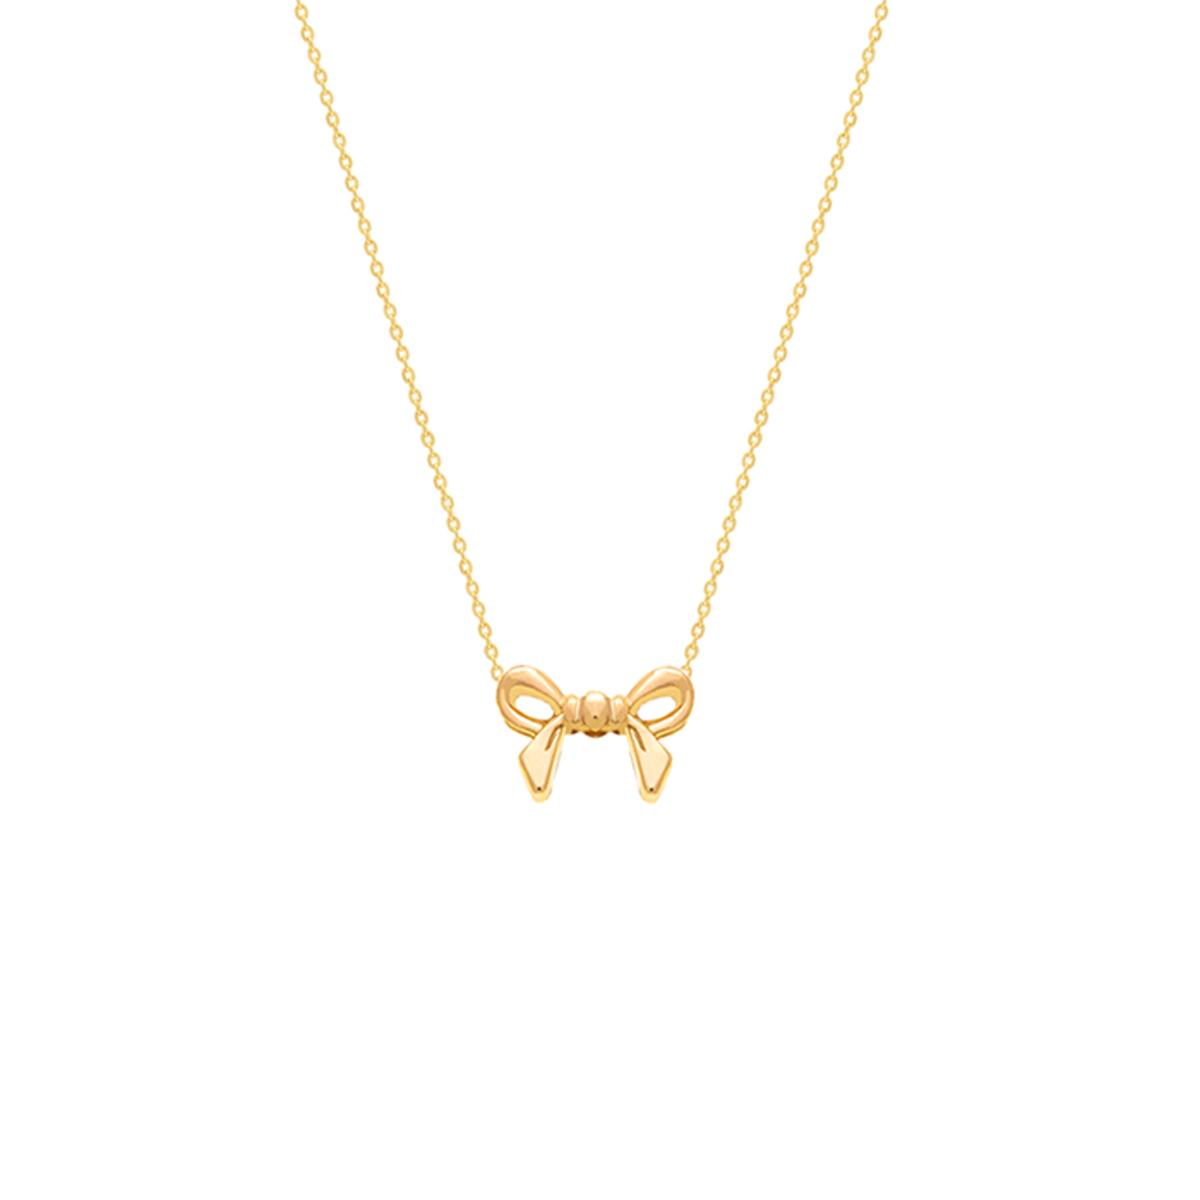 گردنبند طلا پاپیون